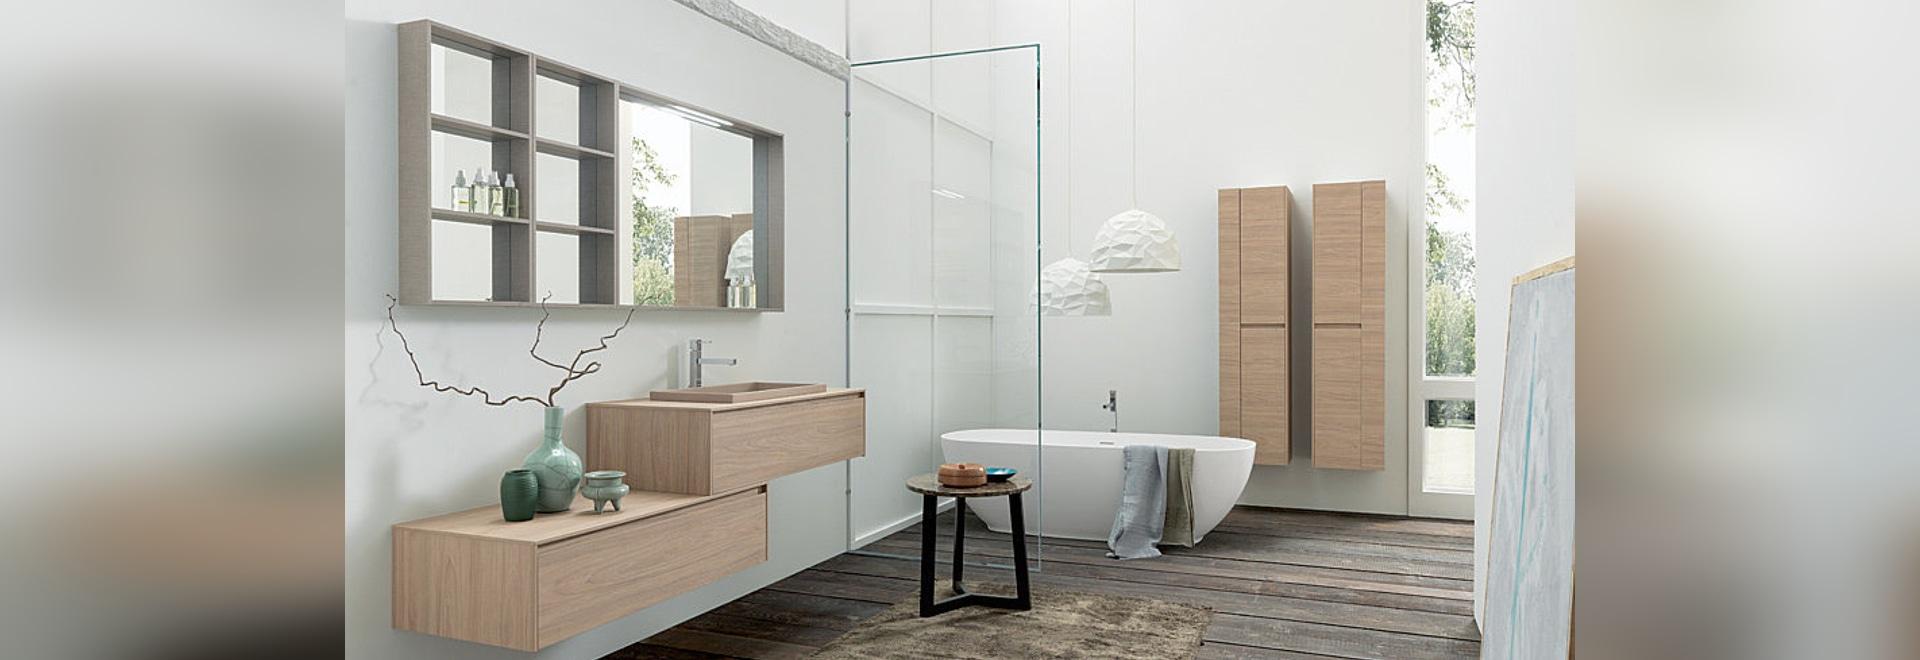 Cuarto de baño contemporáneo: Tulle